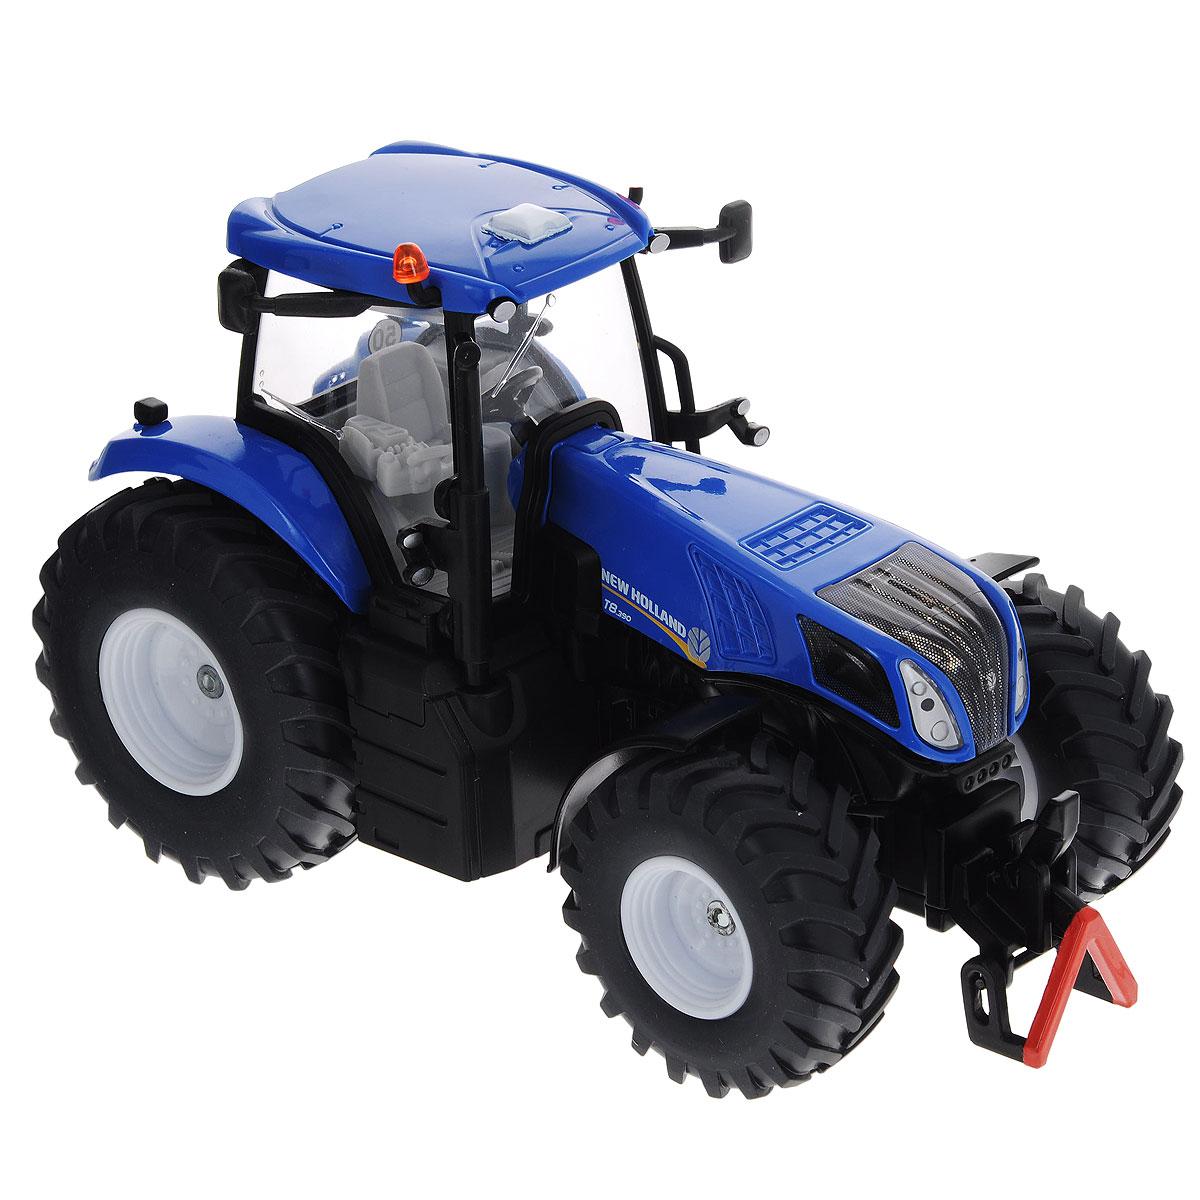 Siku Трактор New Holland T8.390 siku siku 1312 садовый трактор газонокосилка 1 32